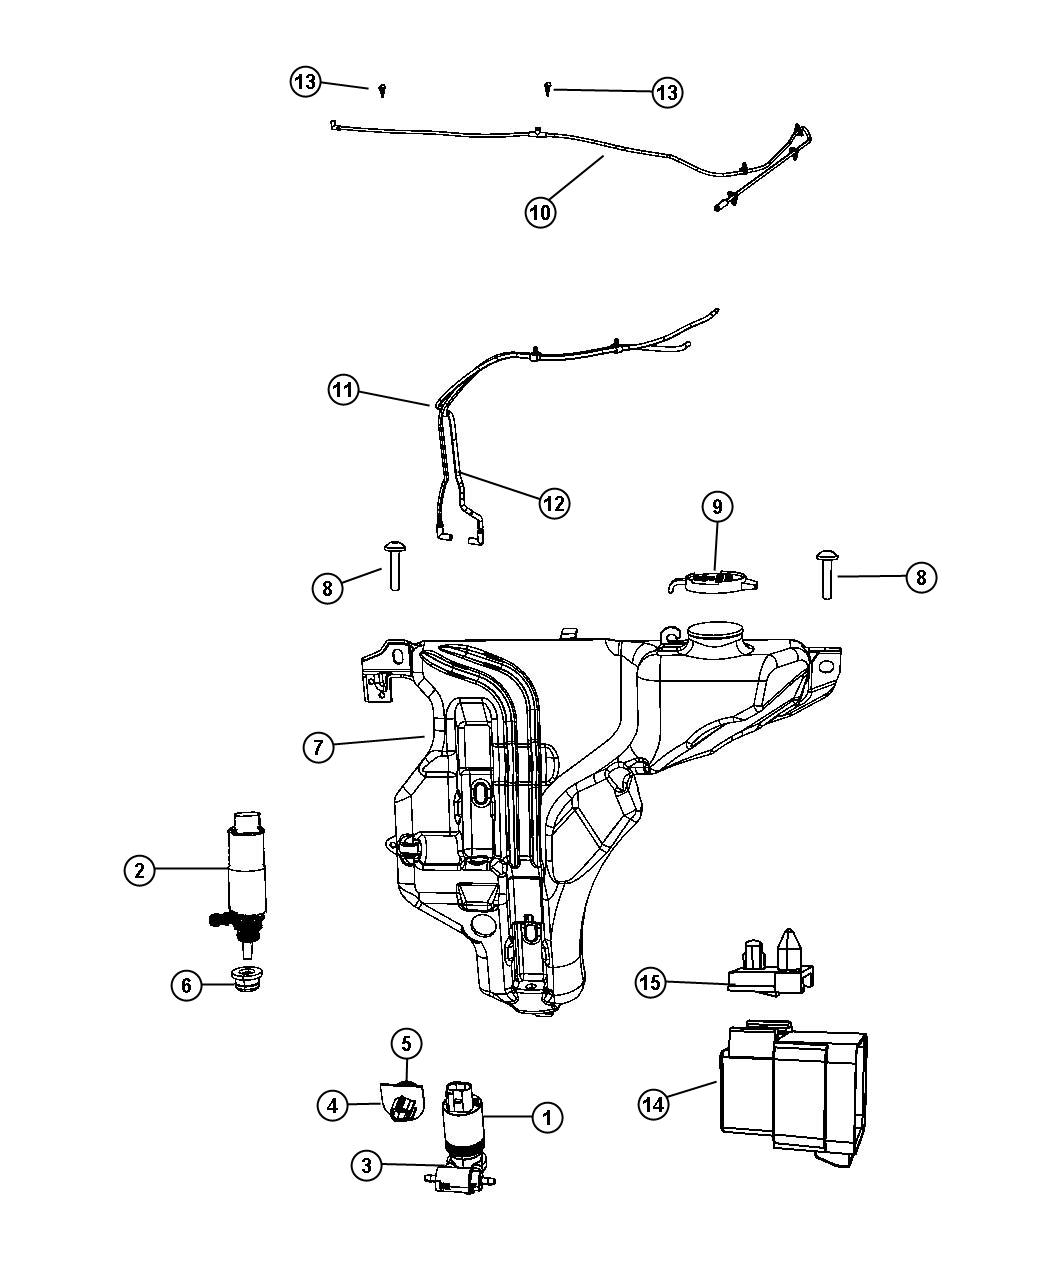 2017 Jeep Patriot Pump, pump package. Washer, windshield